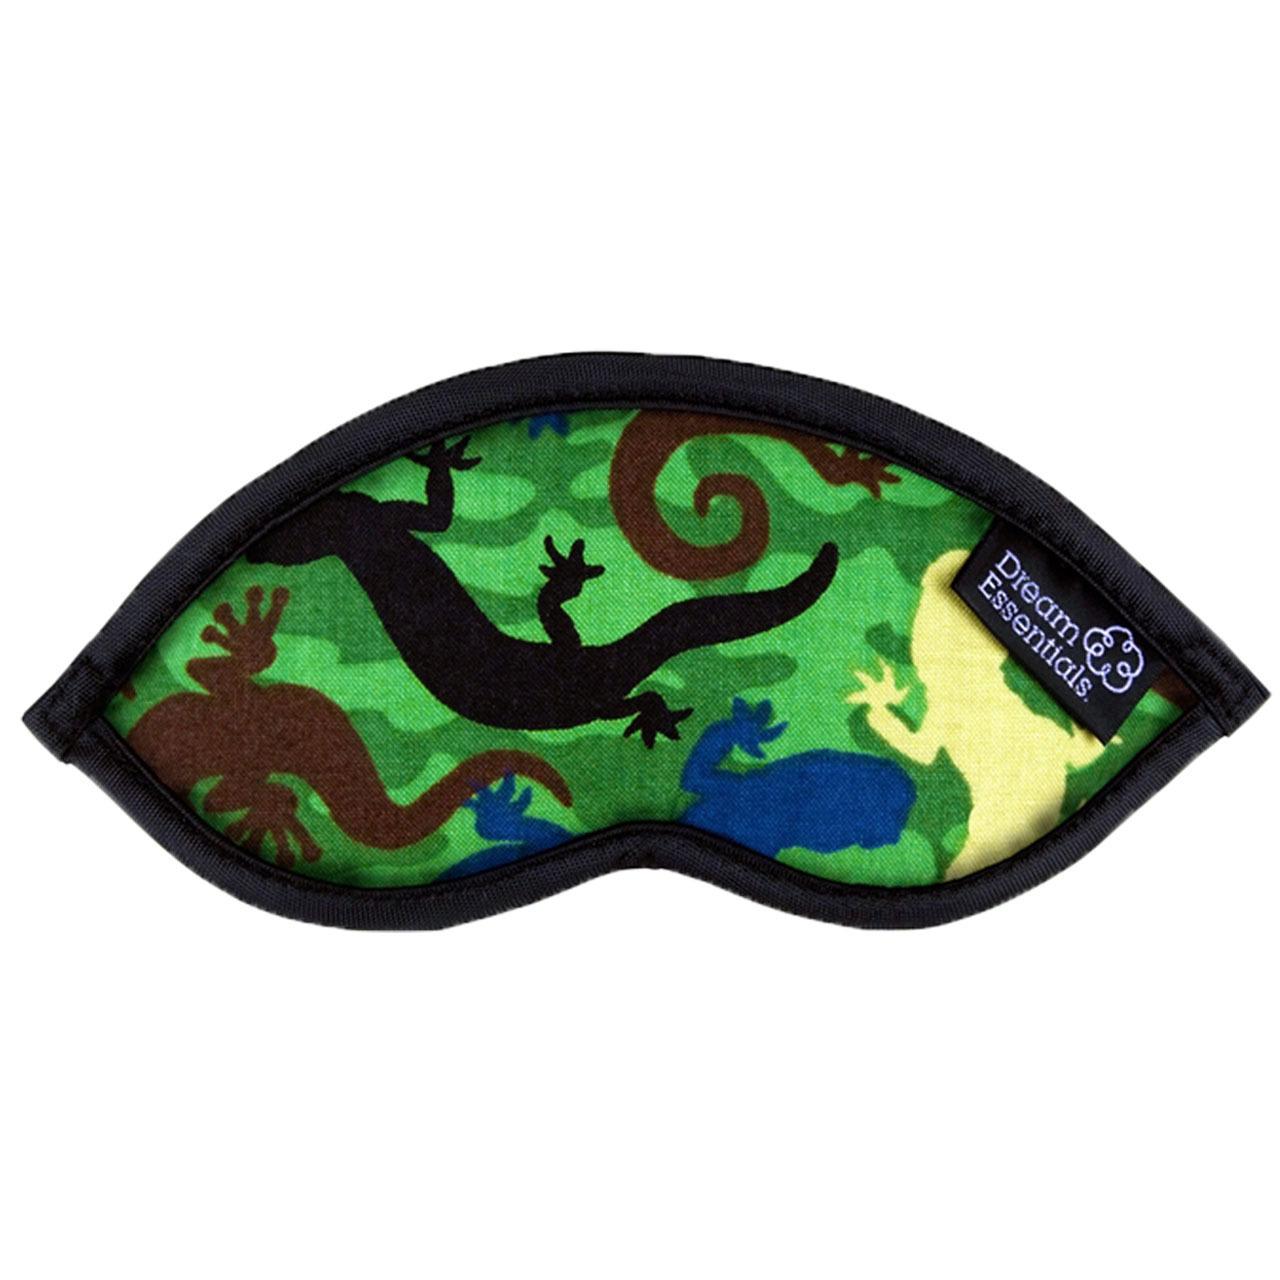 Childrens Travel Sleep Mask - Hush